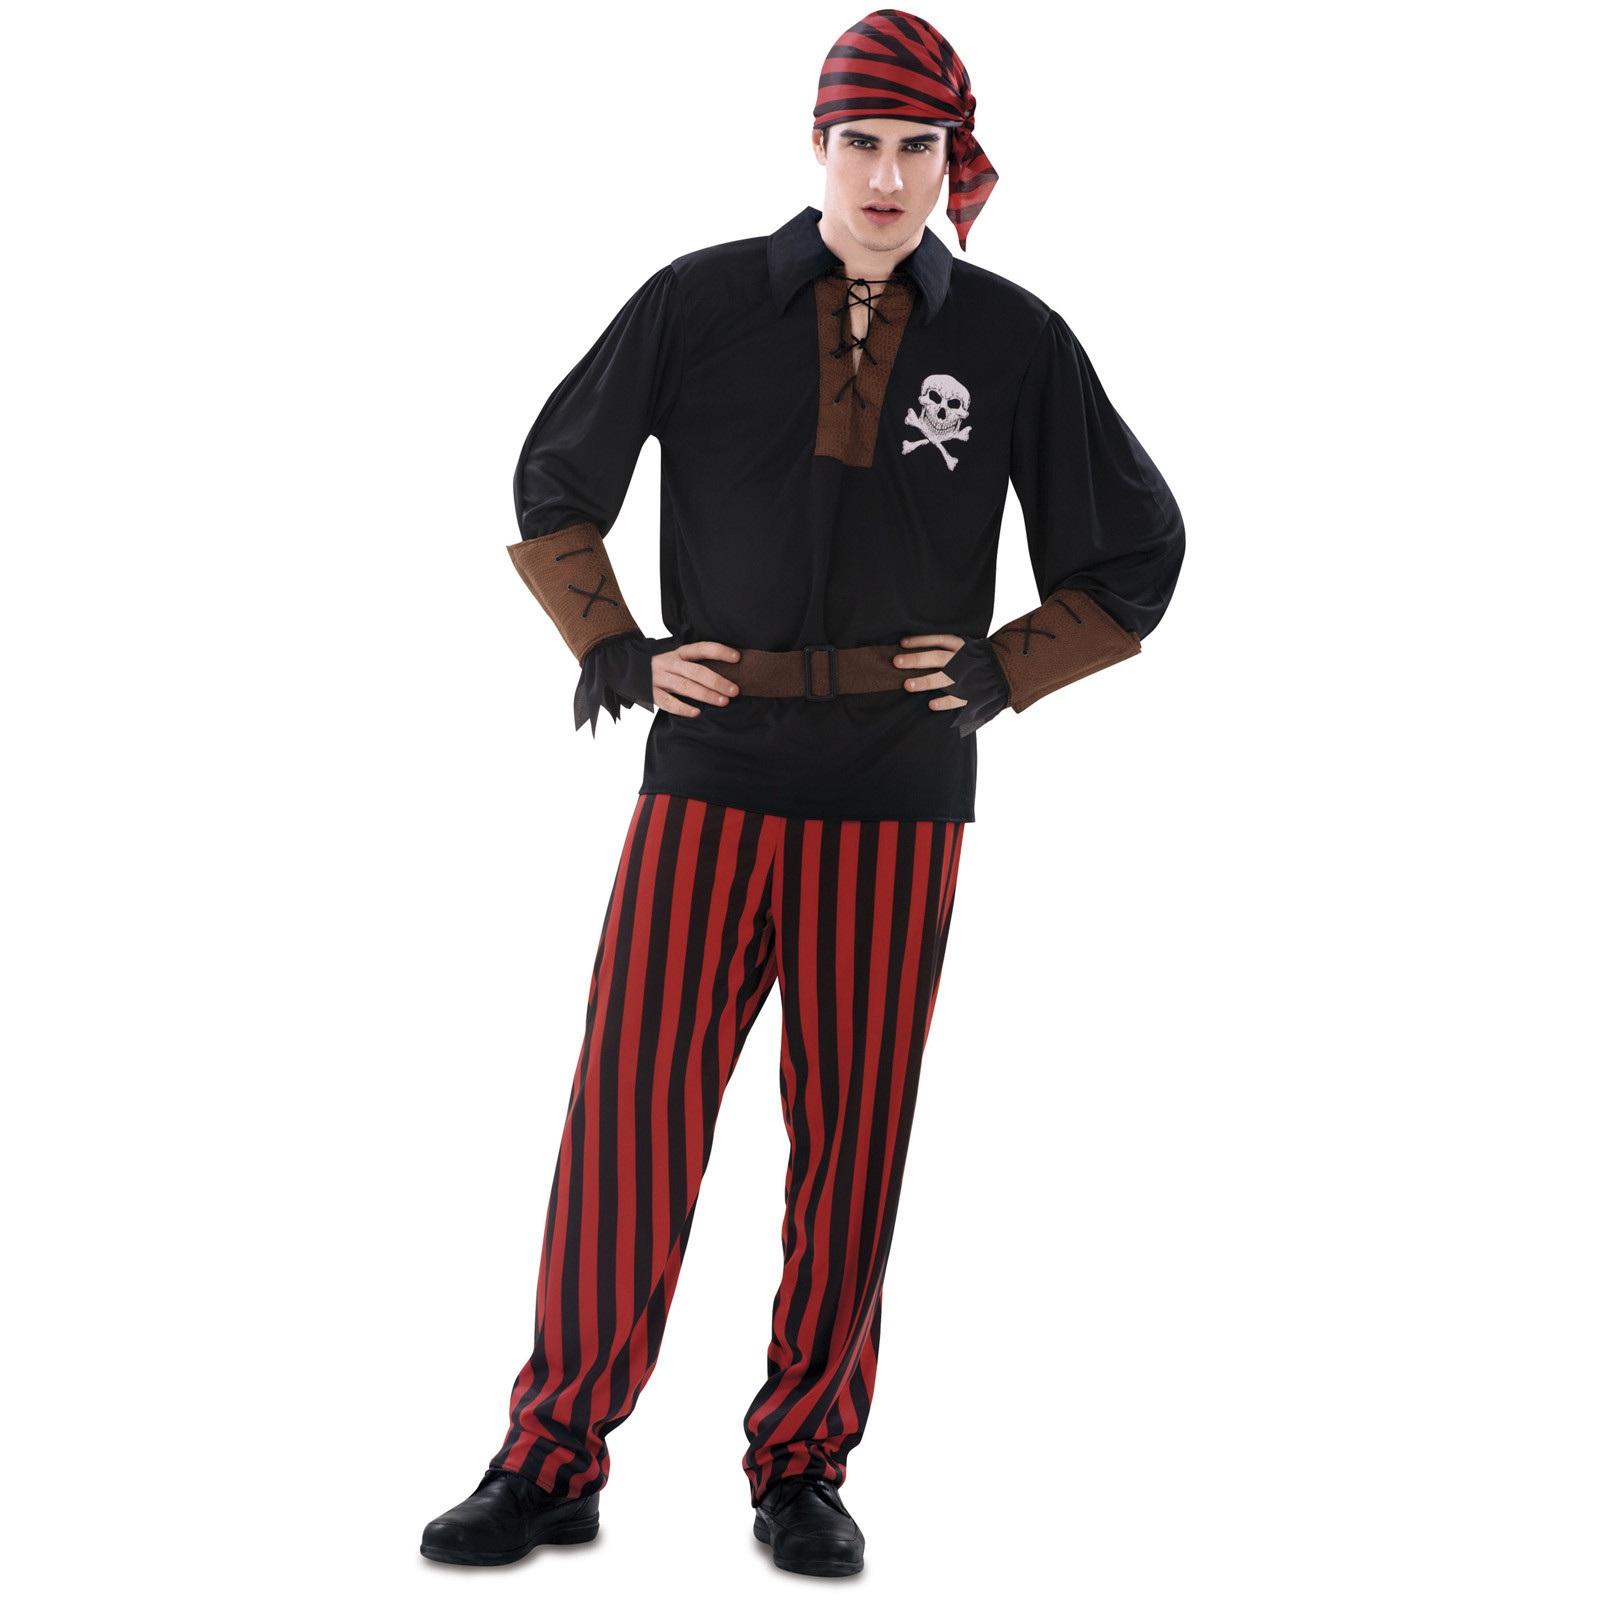 disfraz pirata bandana hombre 200625mom - DISFRAZ DE PIRATA BANDANA HOMBRE